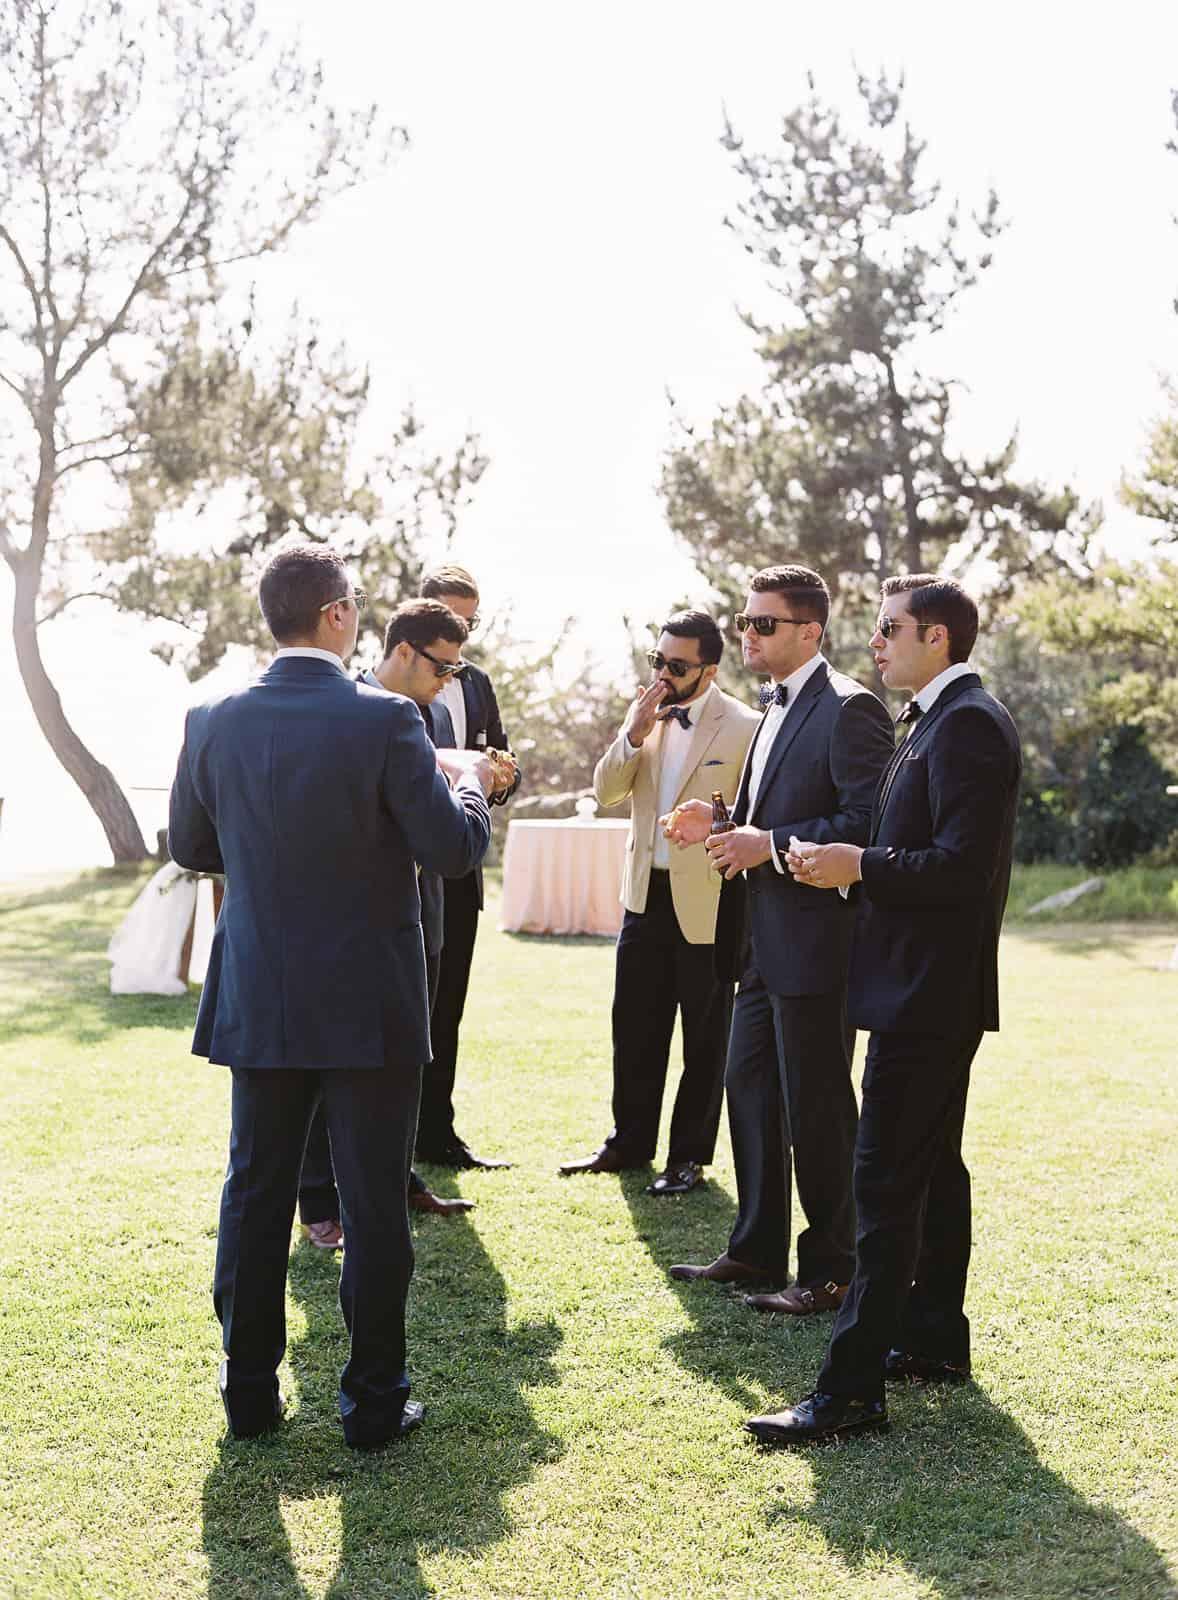 guys standign around talking